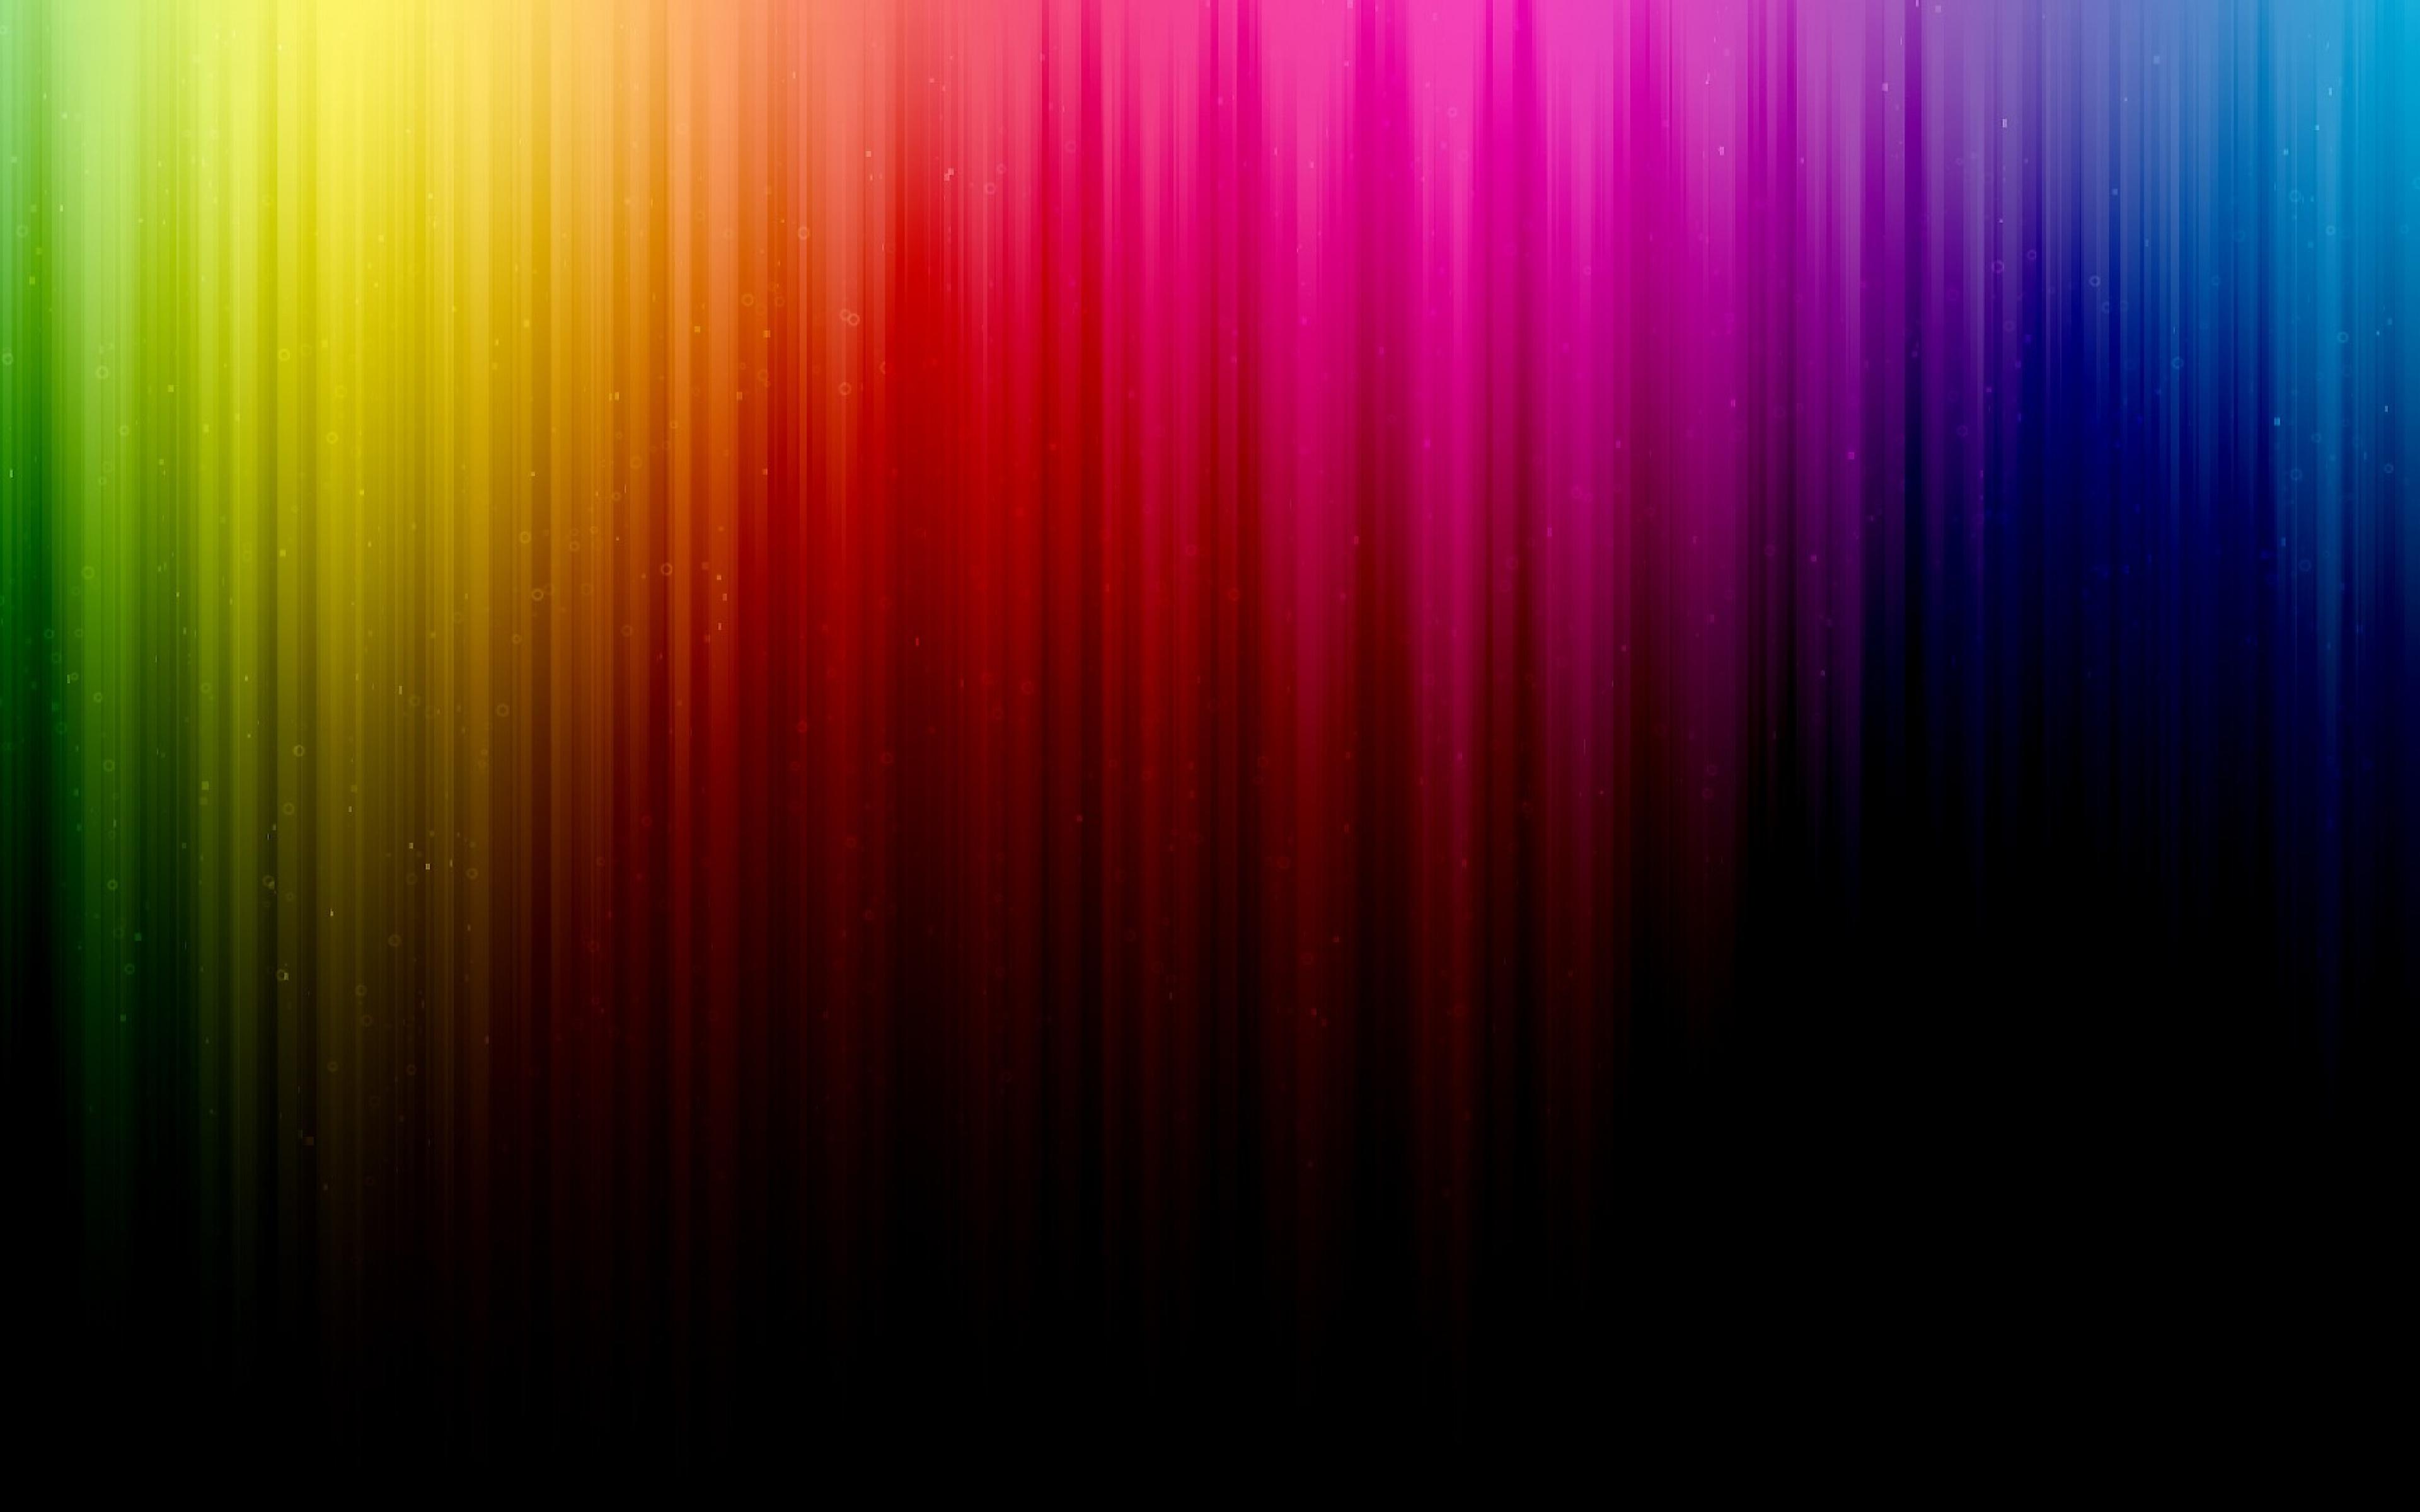 Aviation Wallpaper Iphone X Rainbow Wallpapers Rainbow Stripes 28874